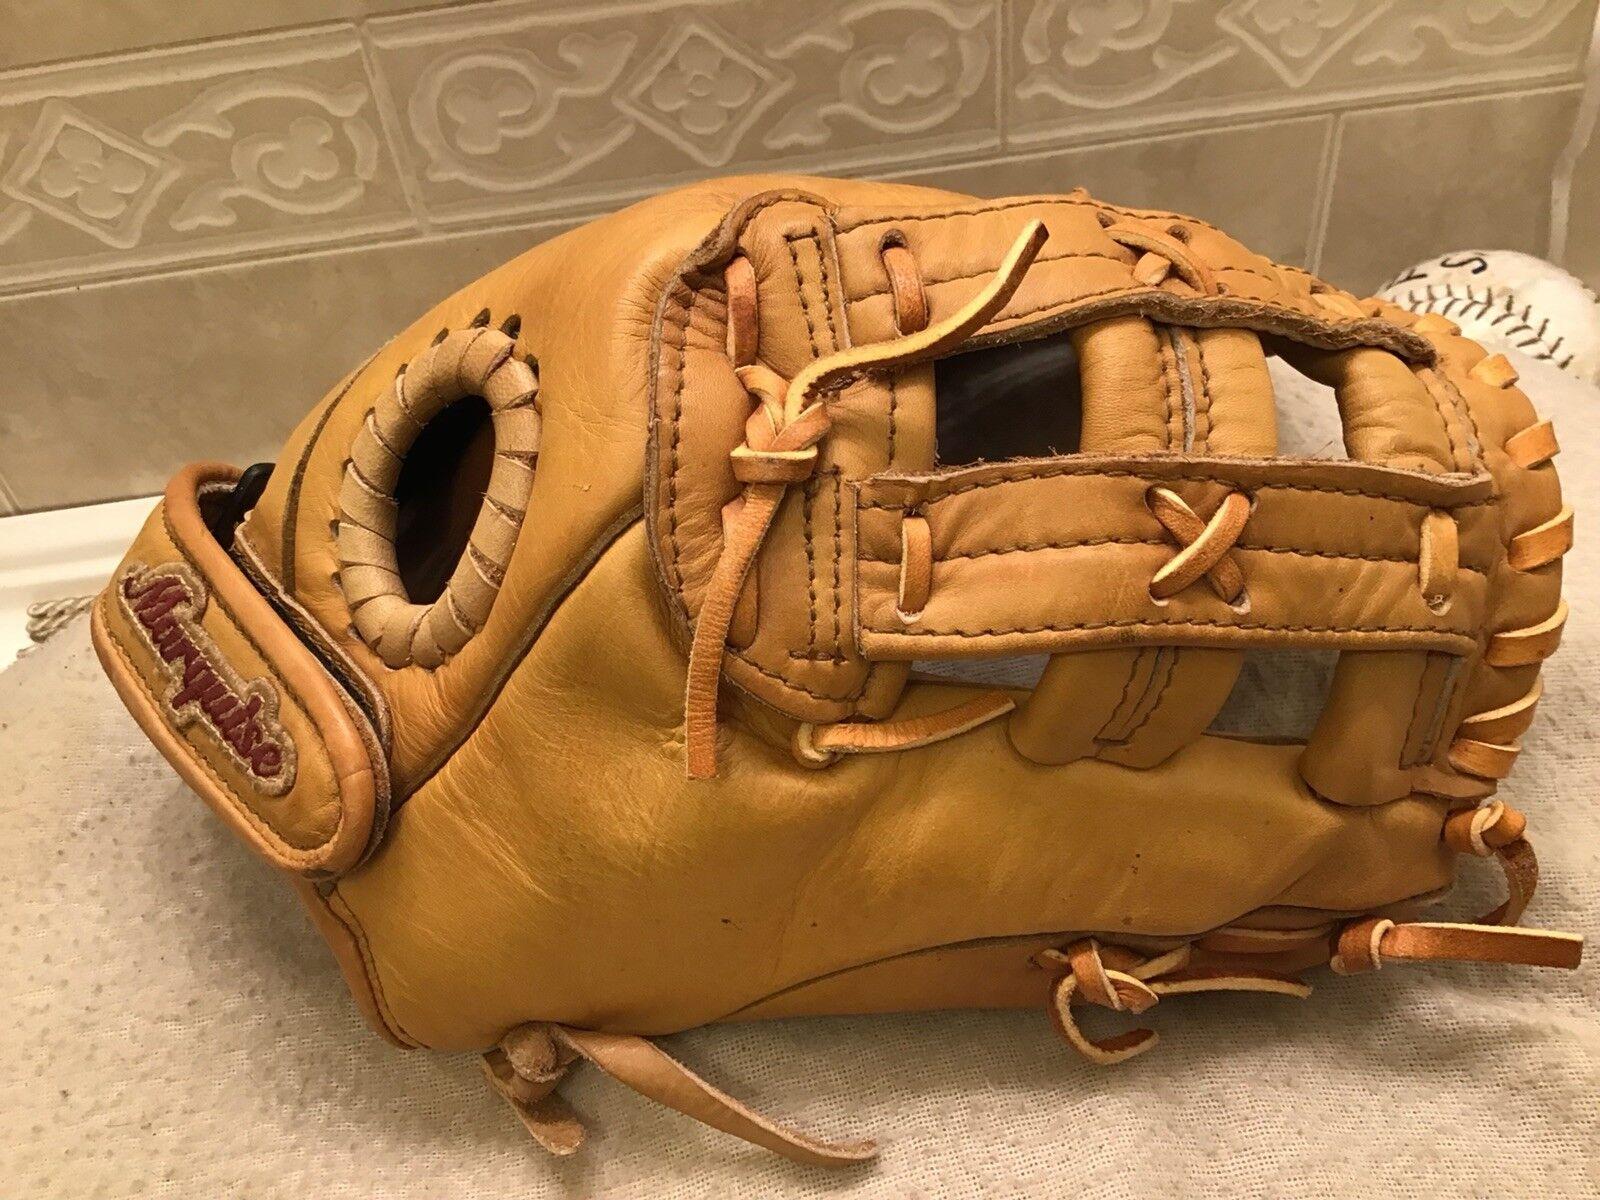 "Nokona Marquise Diamond 12.75"" Fast-Pitch Damenschuhe Fast-Pitch 12.75"" Softball Glove Right Hand Throw e9ac6b"